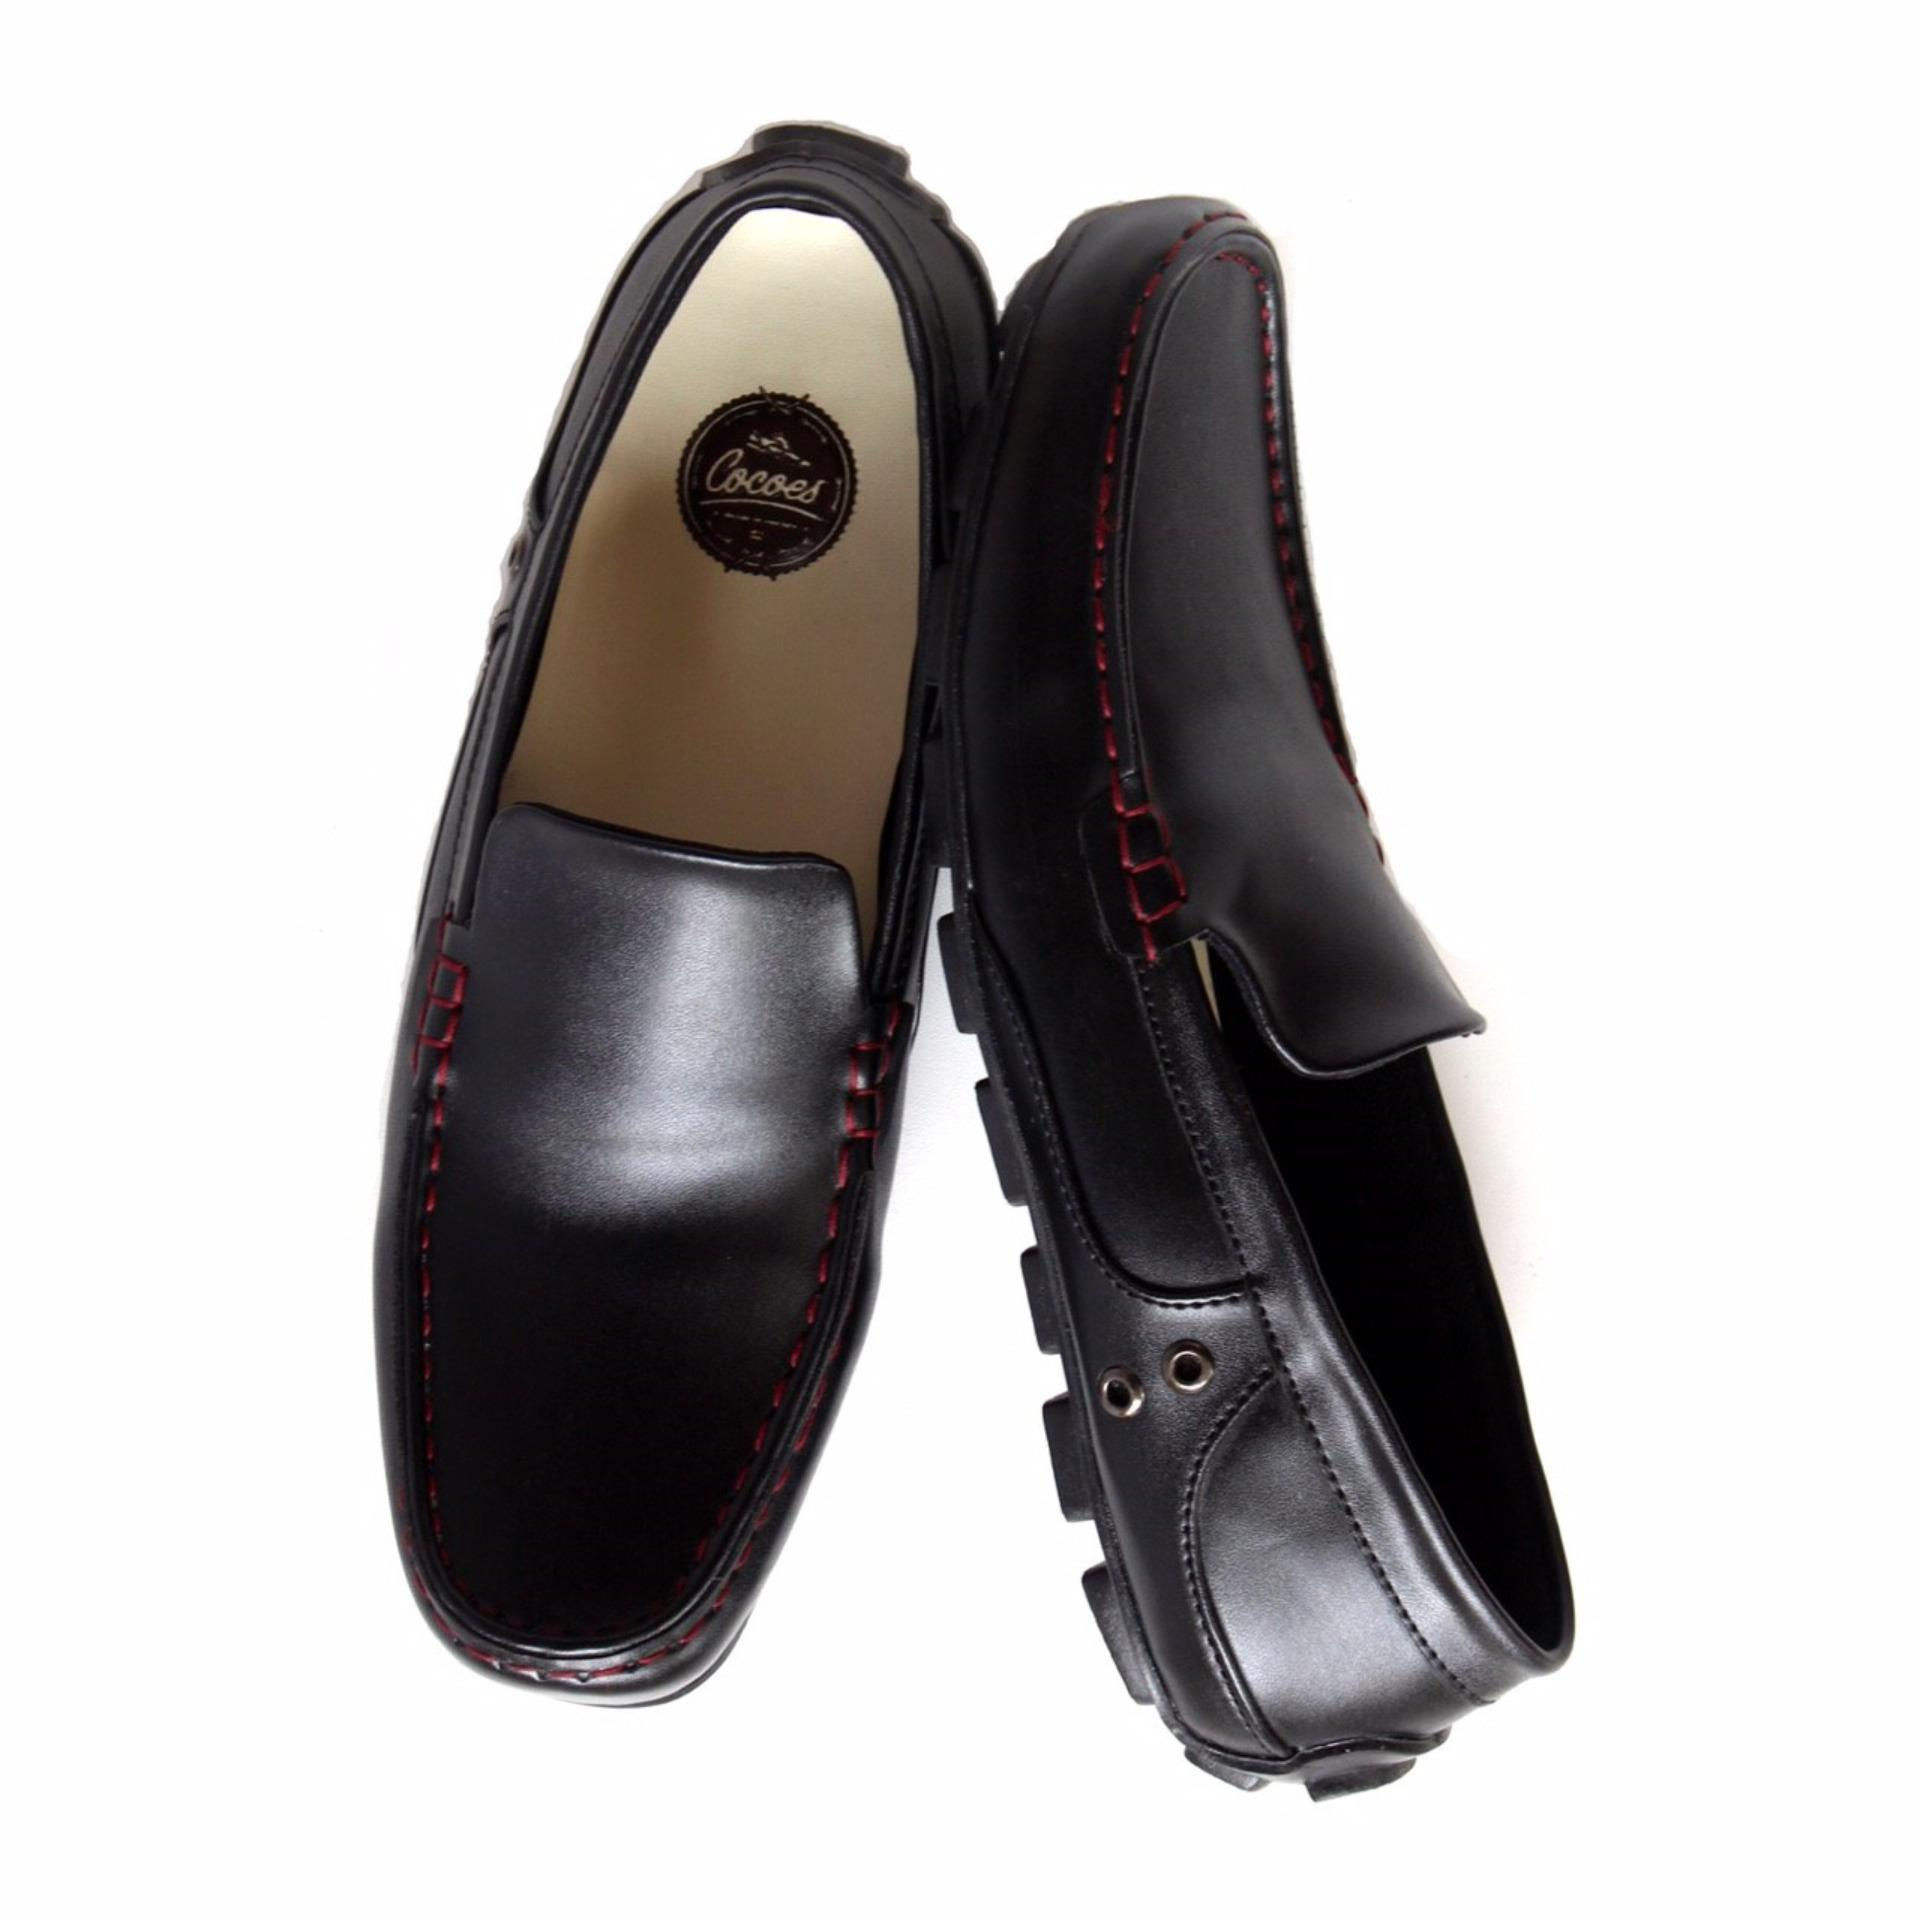 Spesifikasi Sepatu Slip On Cocoes Attore Beserta Harganya